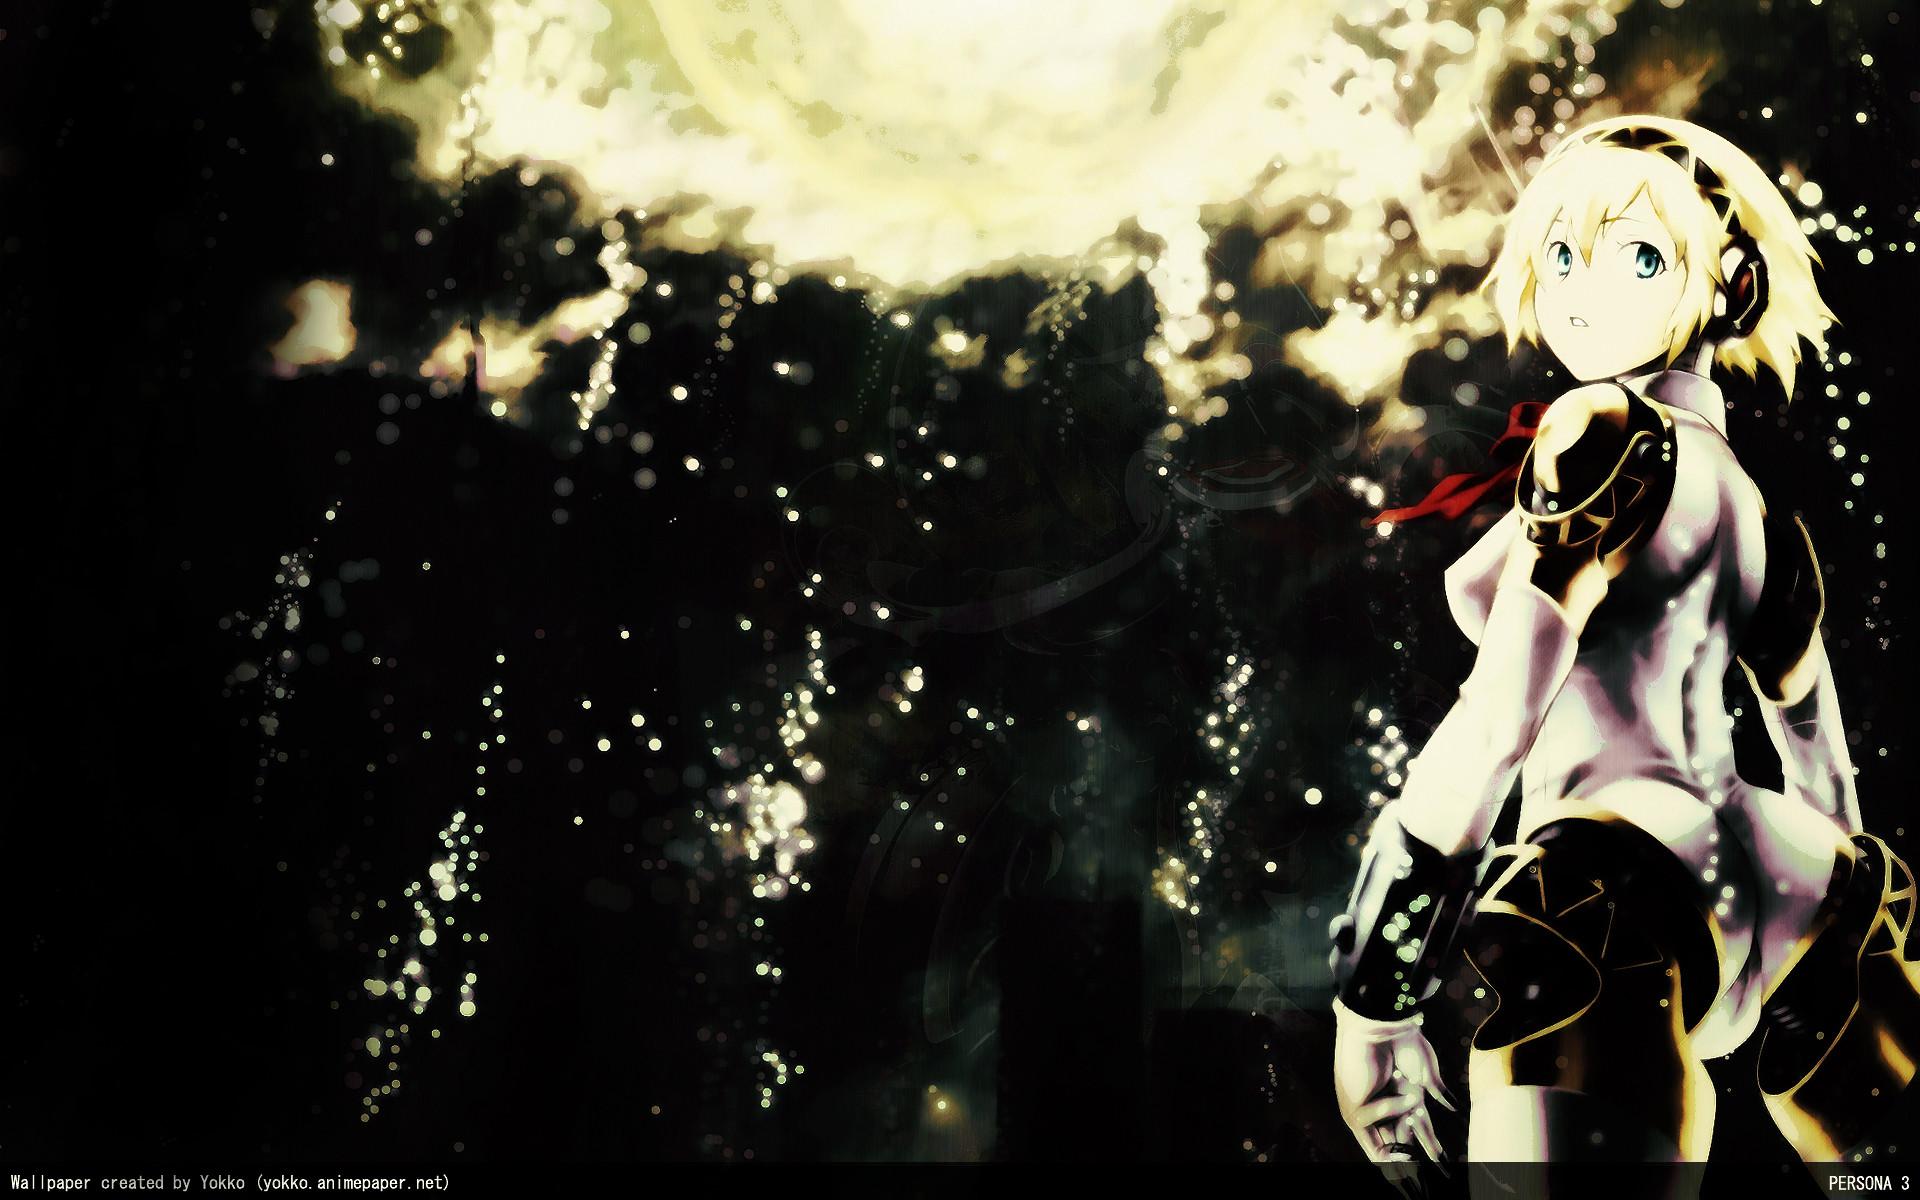 Persona Series Persona 3 Looking Back Aigis Fresh New Hd Wallpaper [Your  Popular HD Wallpaper